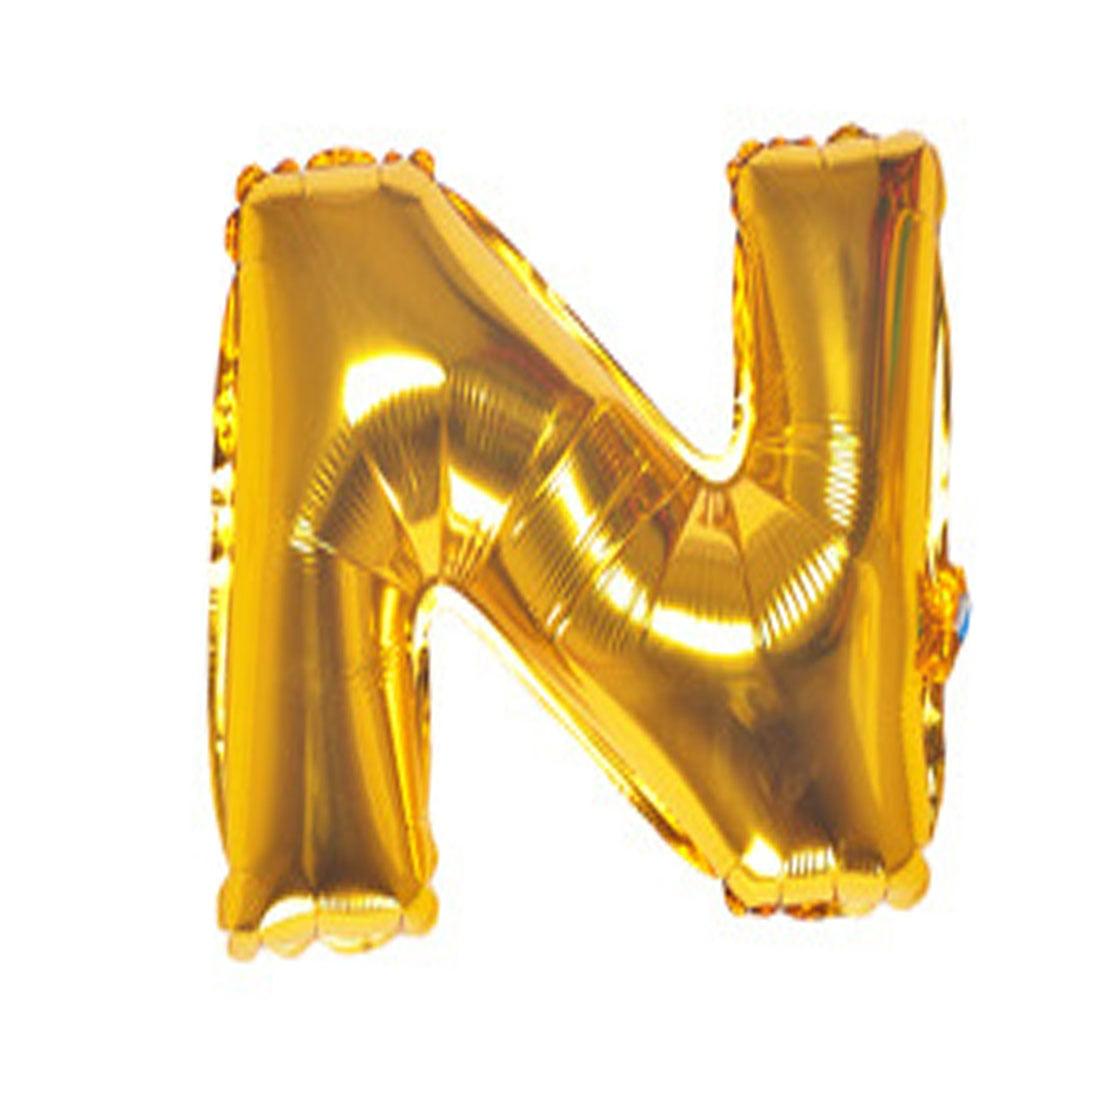 "Unique Bargains 40"" Gold Tone Foil Letter N Balloon Helium Birthday Wedding Festival Decor"